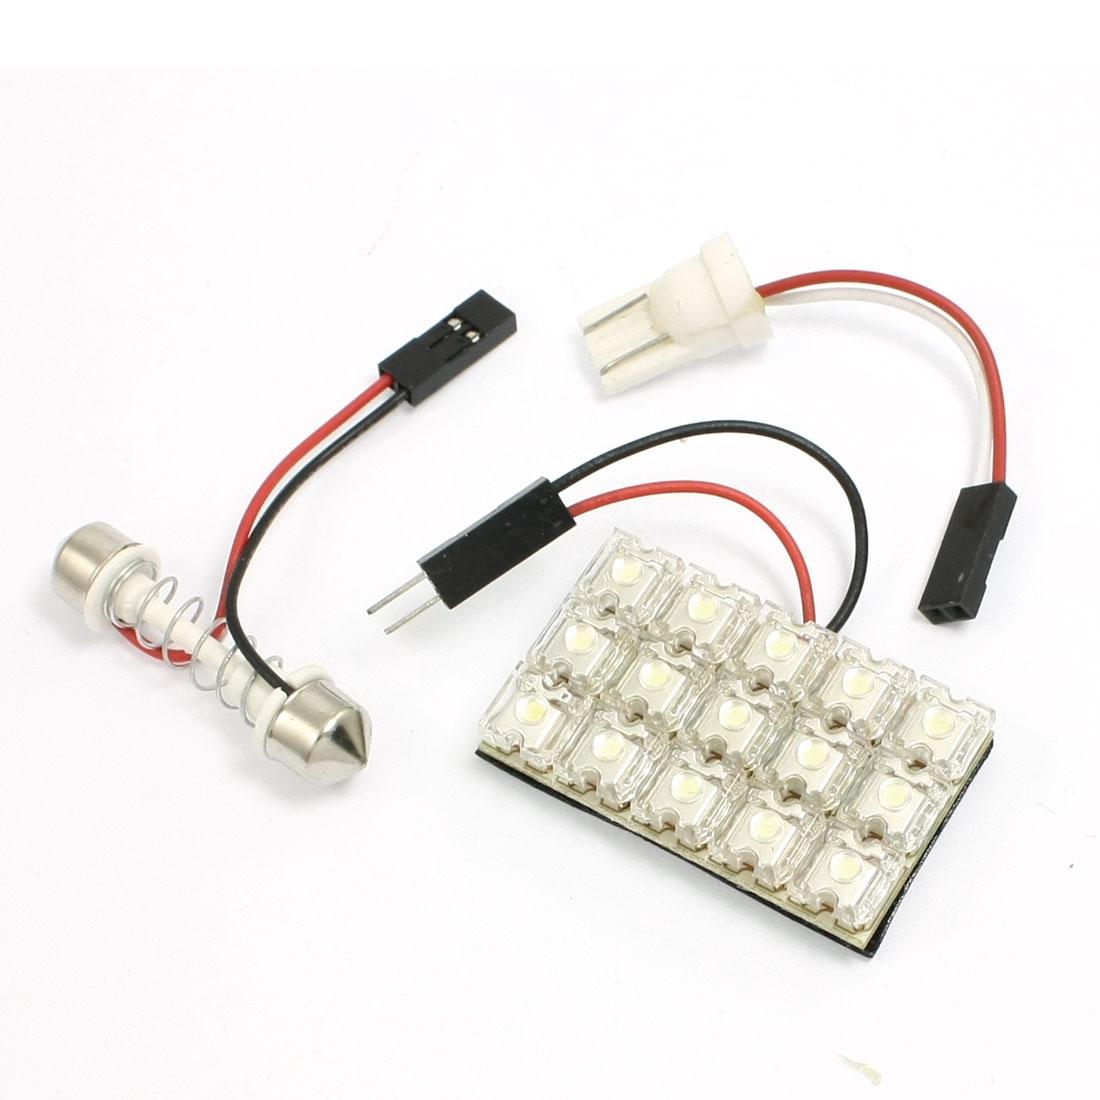 Vehicle Auto T10 Adapter + Light Panel 15 LED + Dome Festoon Bulb Lamp White